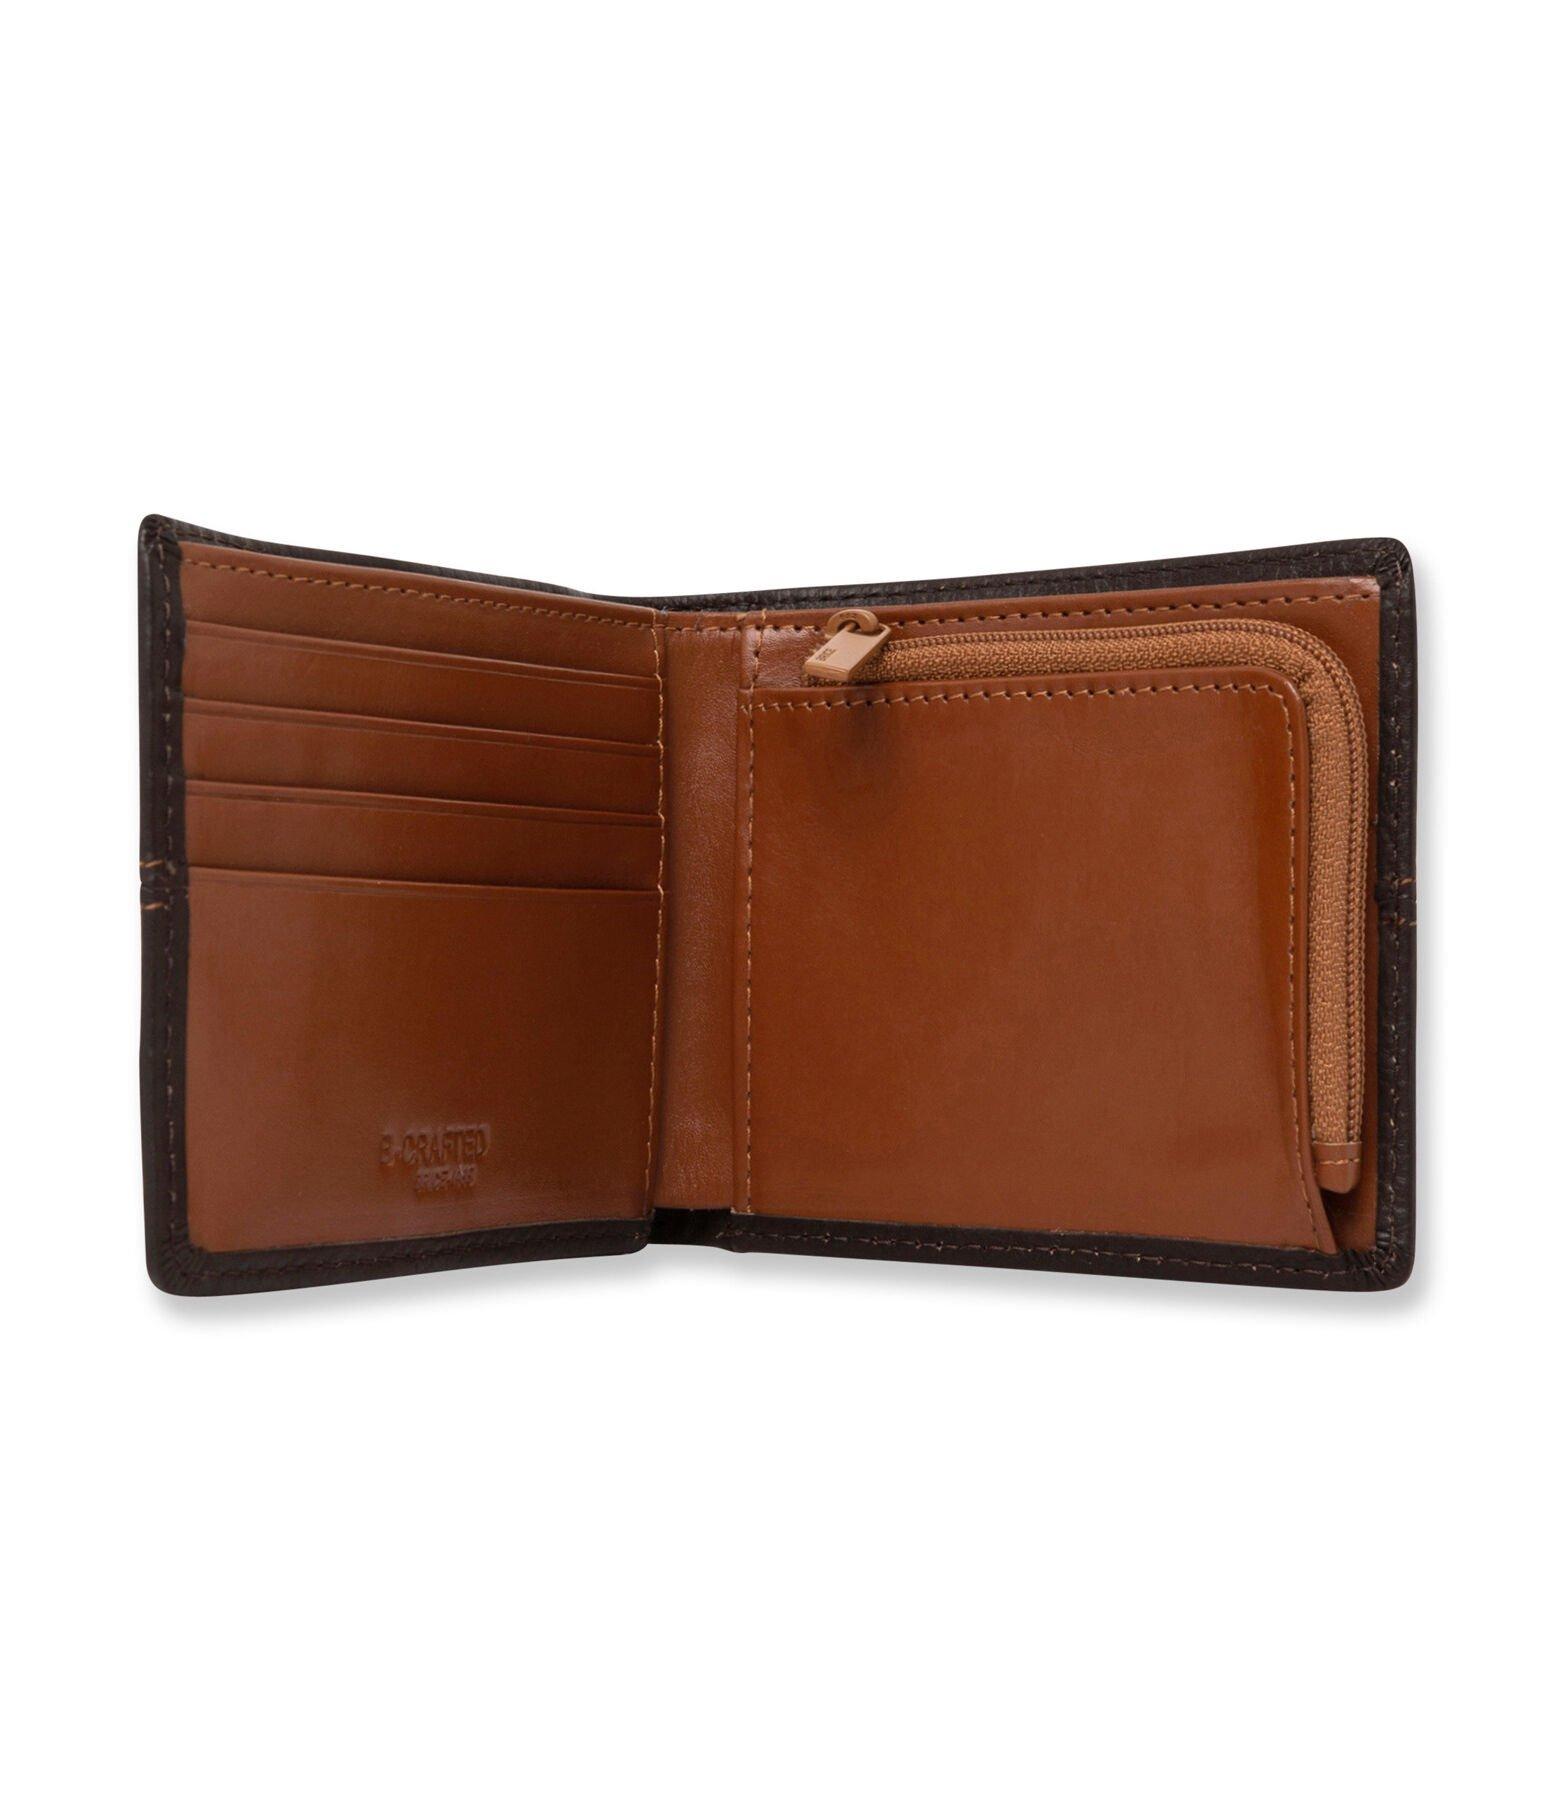 Portefeuille homme horizontal en cuir marron